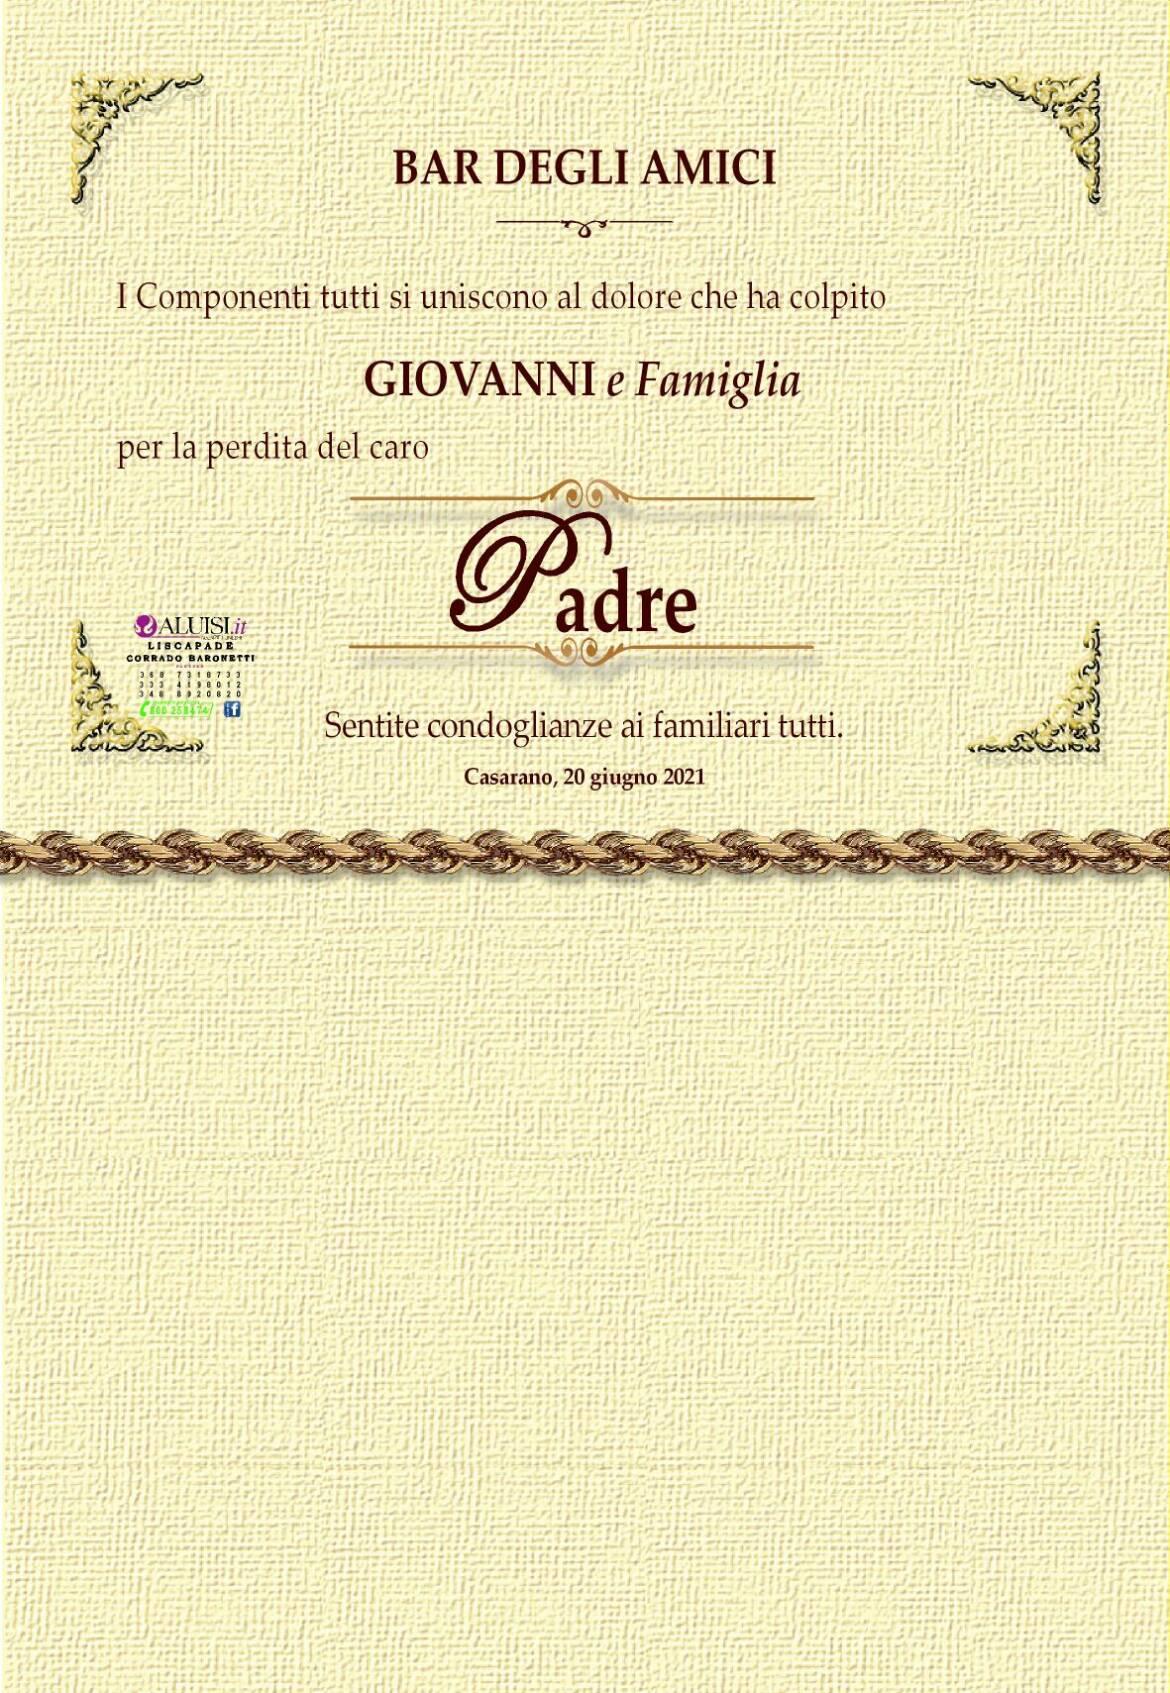 PARTECIPAZIONI-LUIGI-PANTALEO-PRIMICERI-CASARANO-3-1.jpg